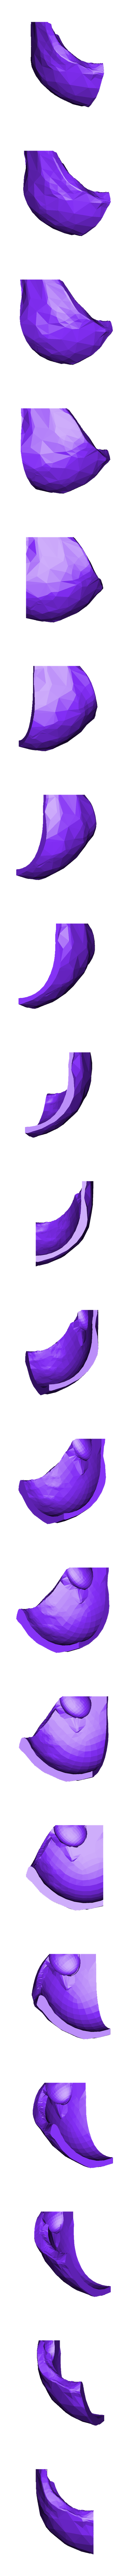 skull_main_V2_iris_goggles_repaired_Cut_1_Cut_2_Cut_1.stl Download free STL file Steampunk Skull helmet V2 • 3D printer design, cube606592